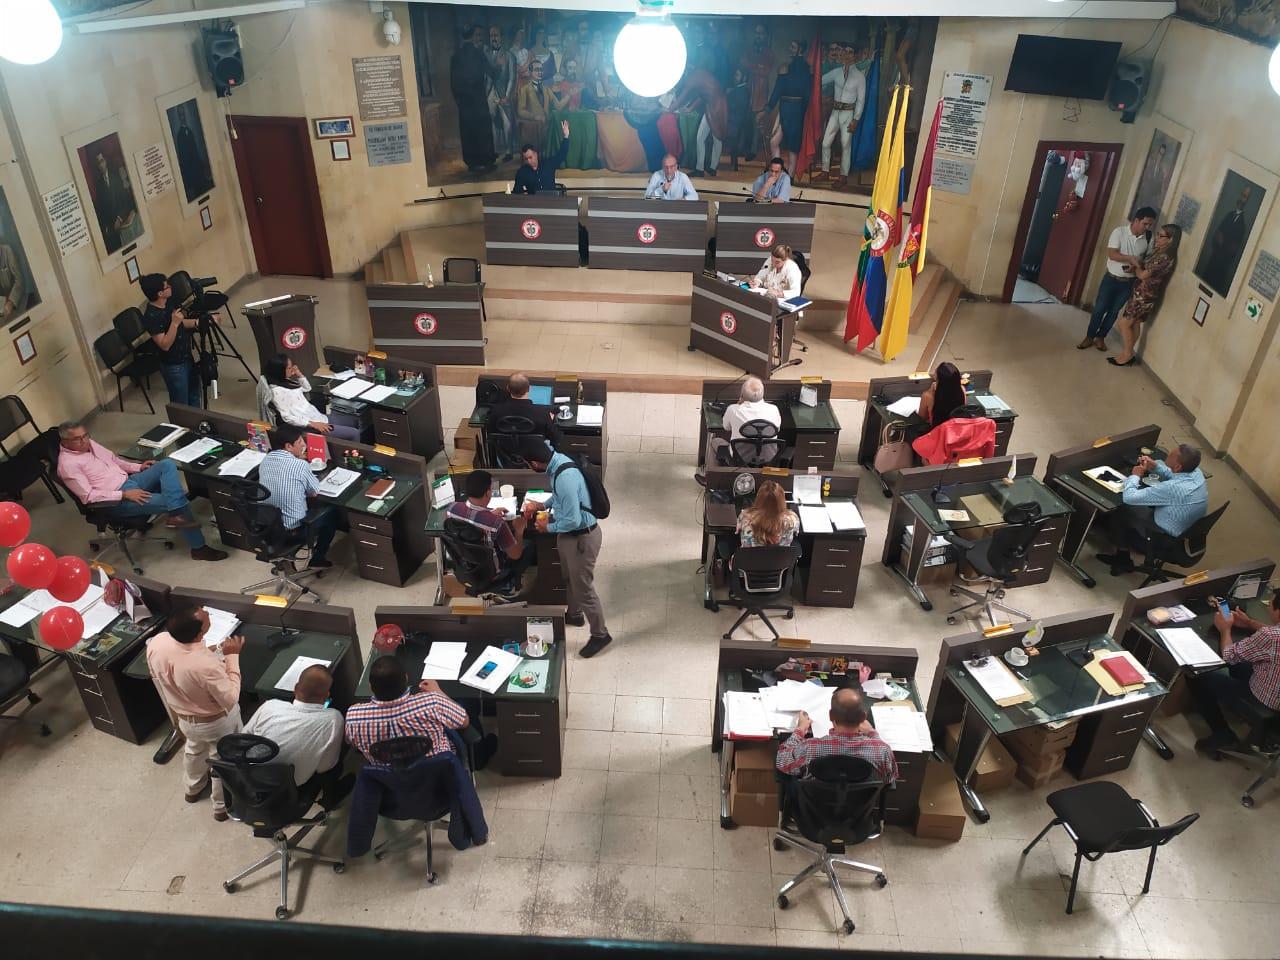 Noticias Ibagué: Concejales de Ibagué arremetieron en contra de Juan Salaza - Alerta Tolima